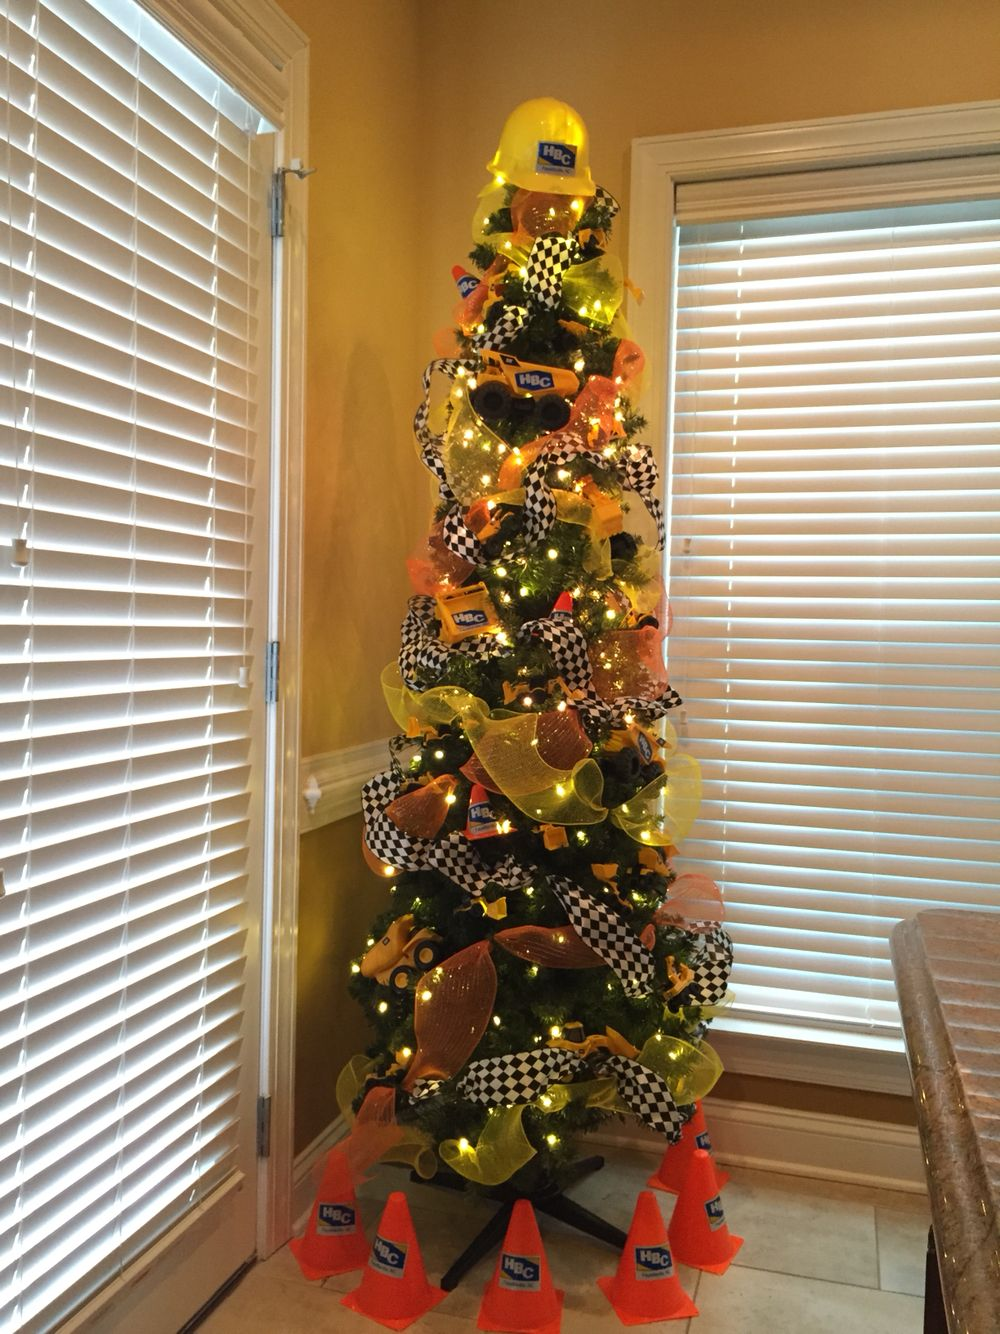 Construction Tree Holiday Decor Crafts Tree